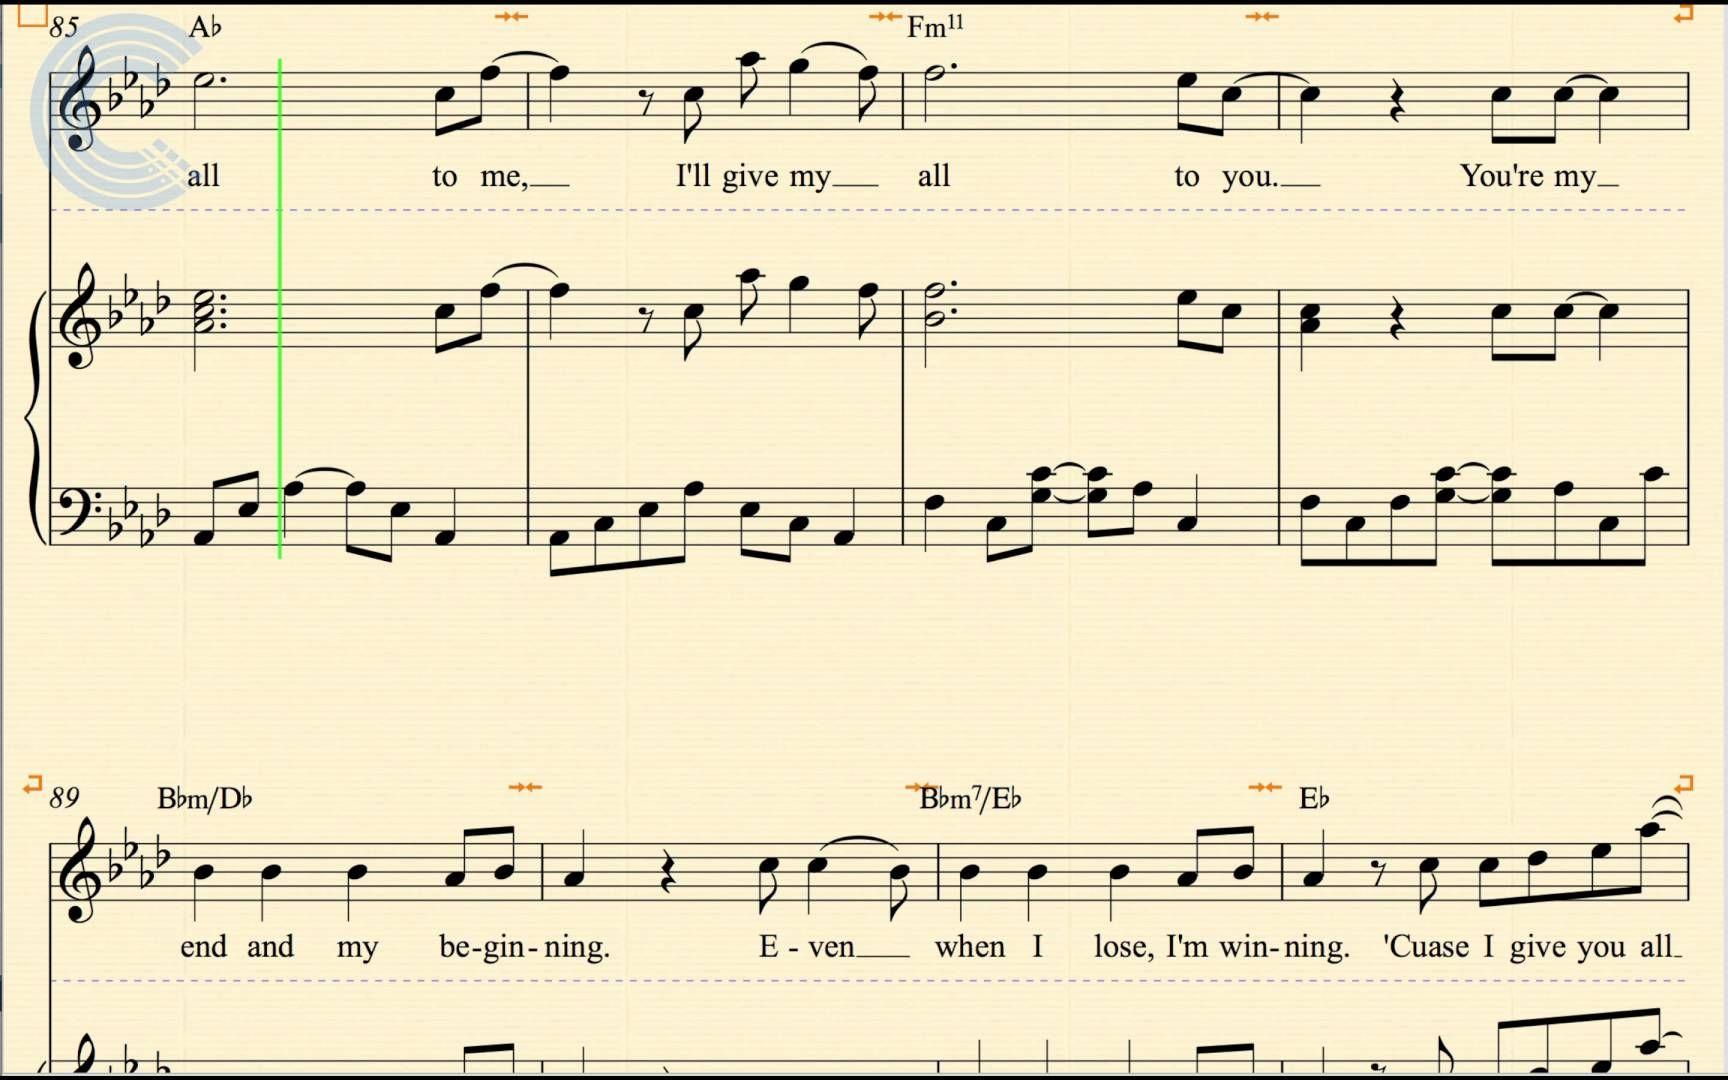 All Of Me Piano Sheet Music piano - all of me - john legend - sheet music, chords